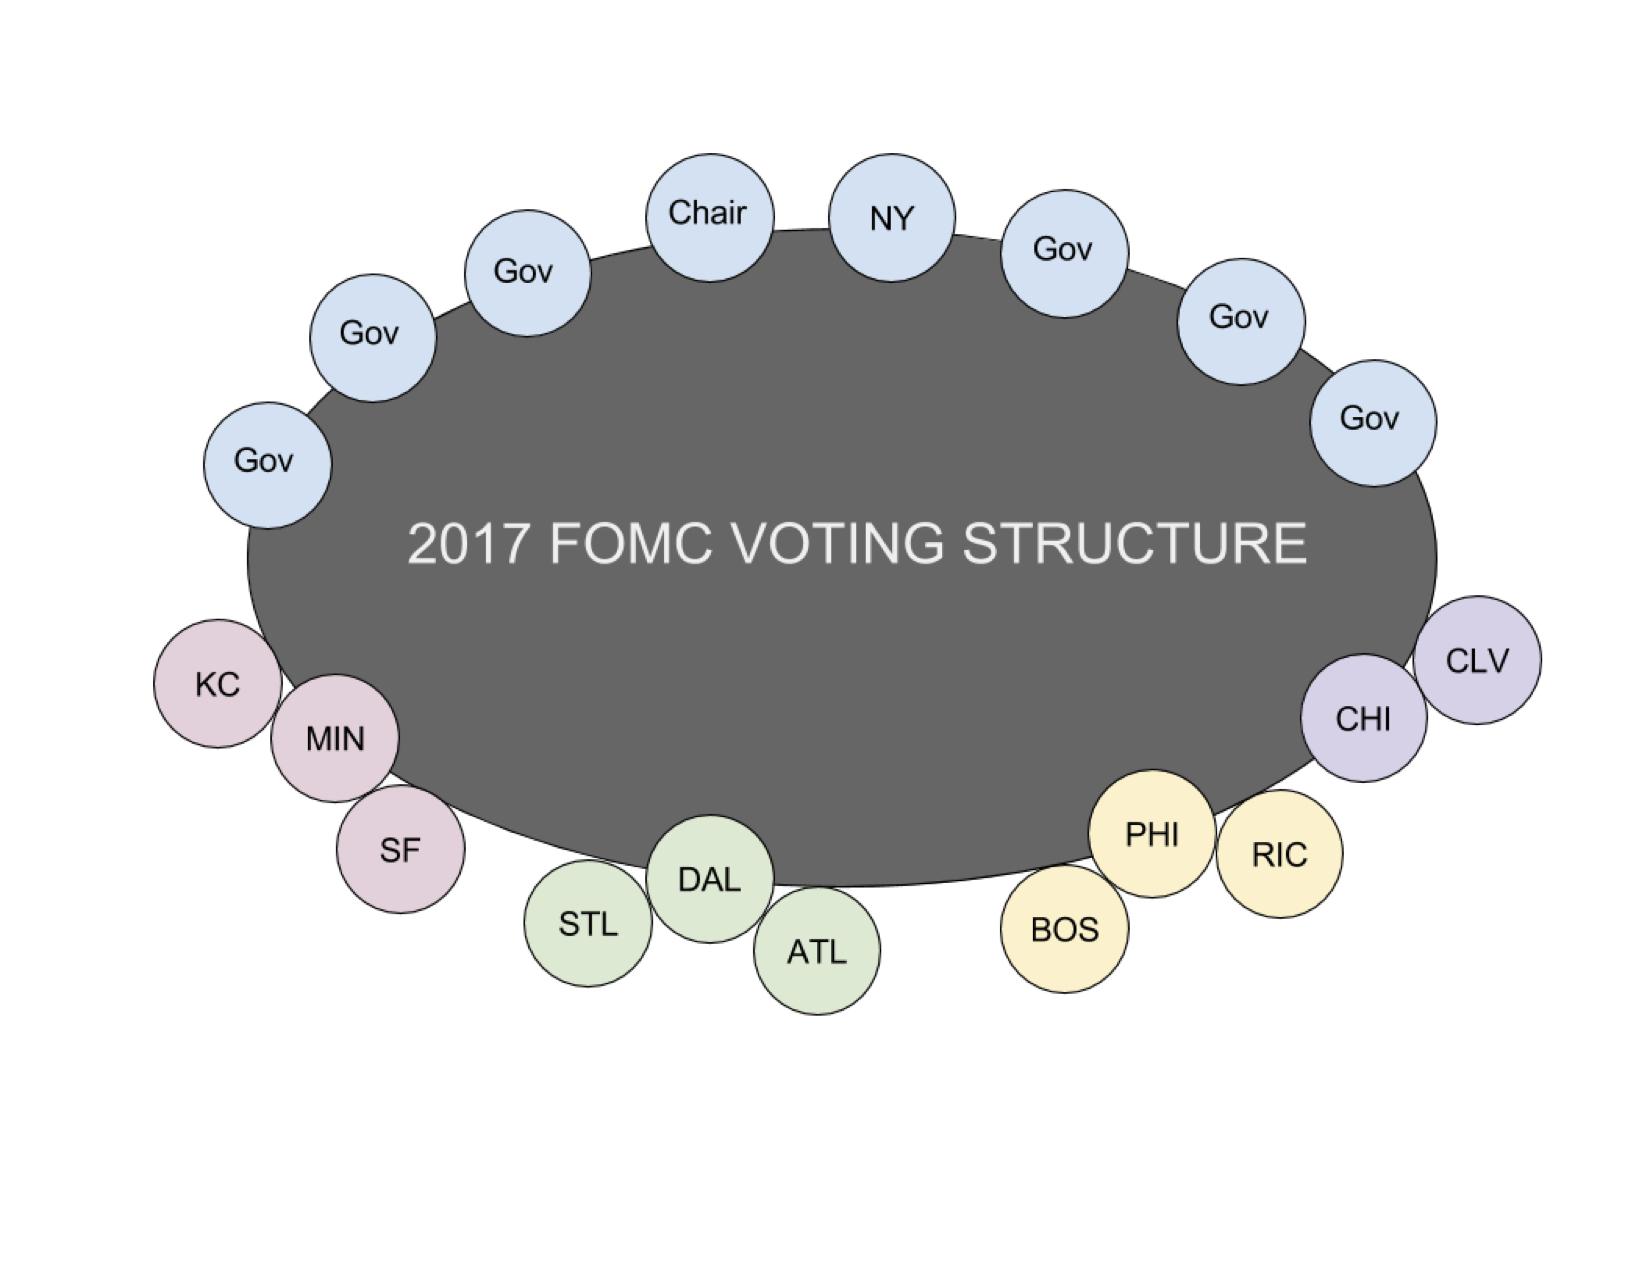 2017 FOMC Voting Structure